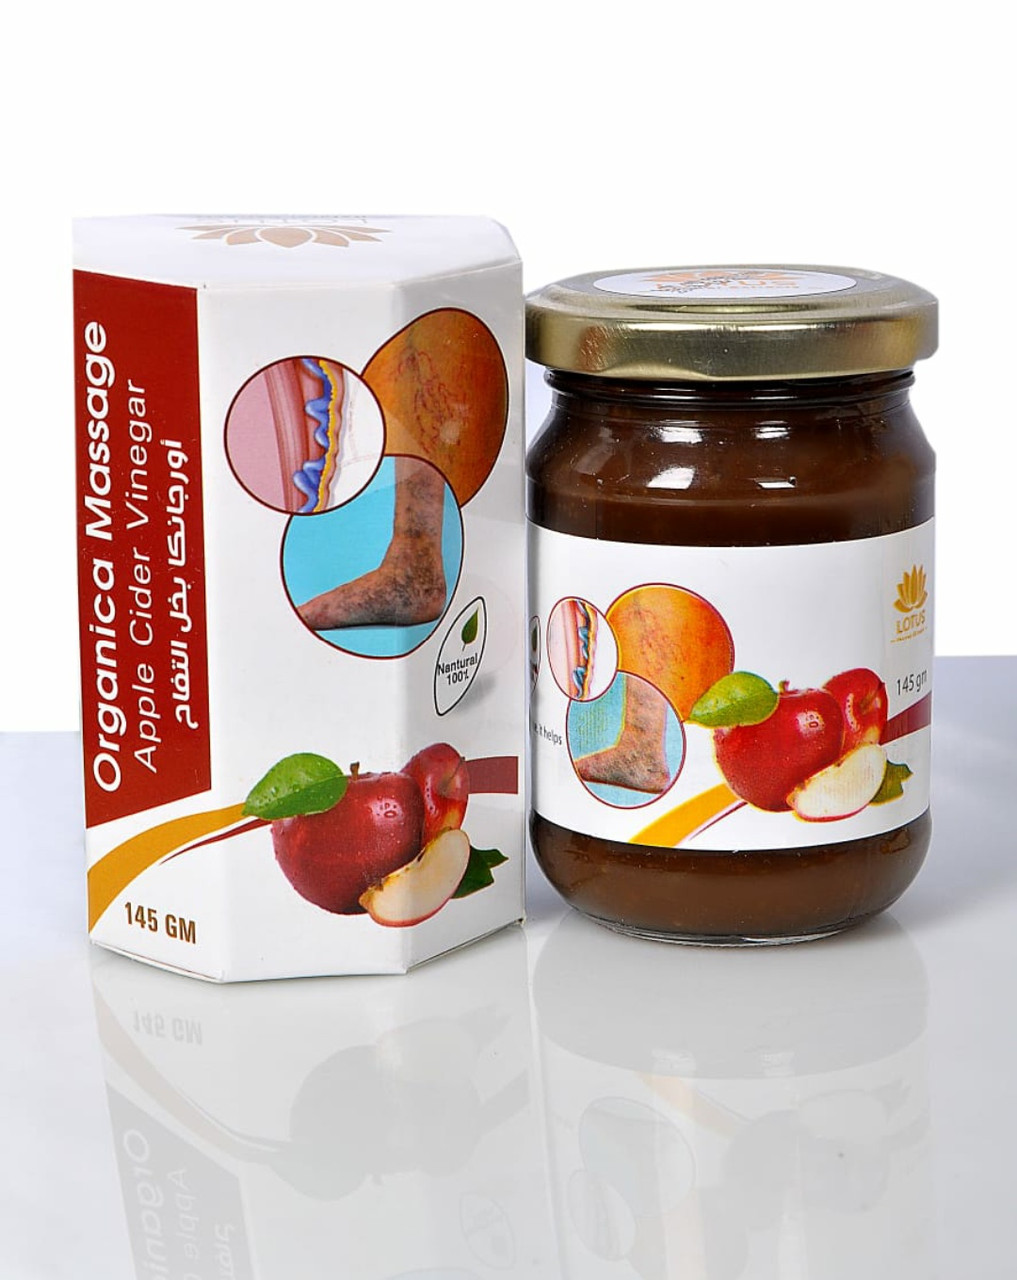 Karismooth Massage Apple cider Vinegar Лечение воспаления скрученных вен епл сидер